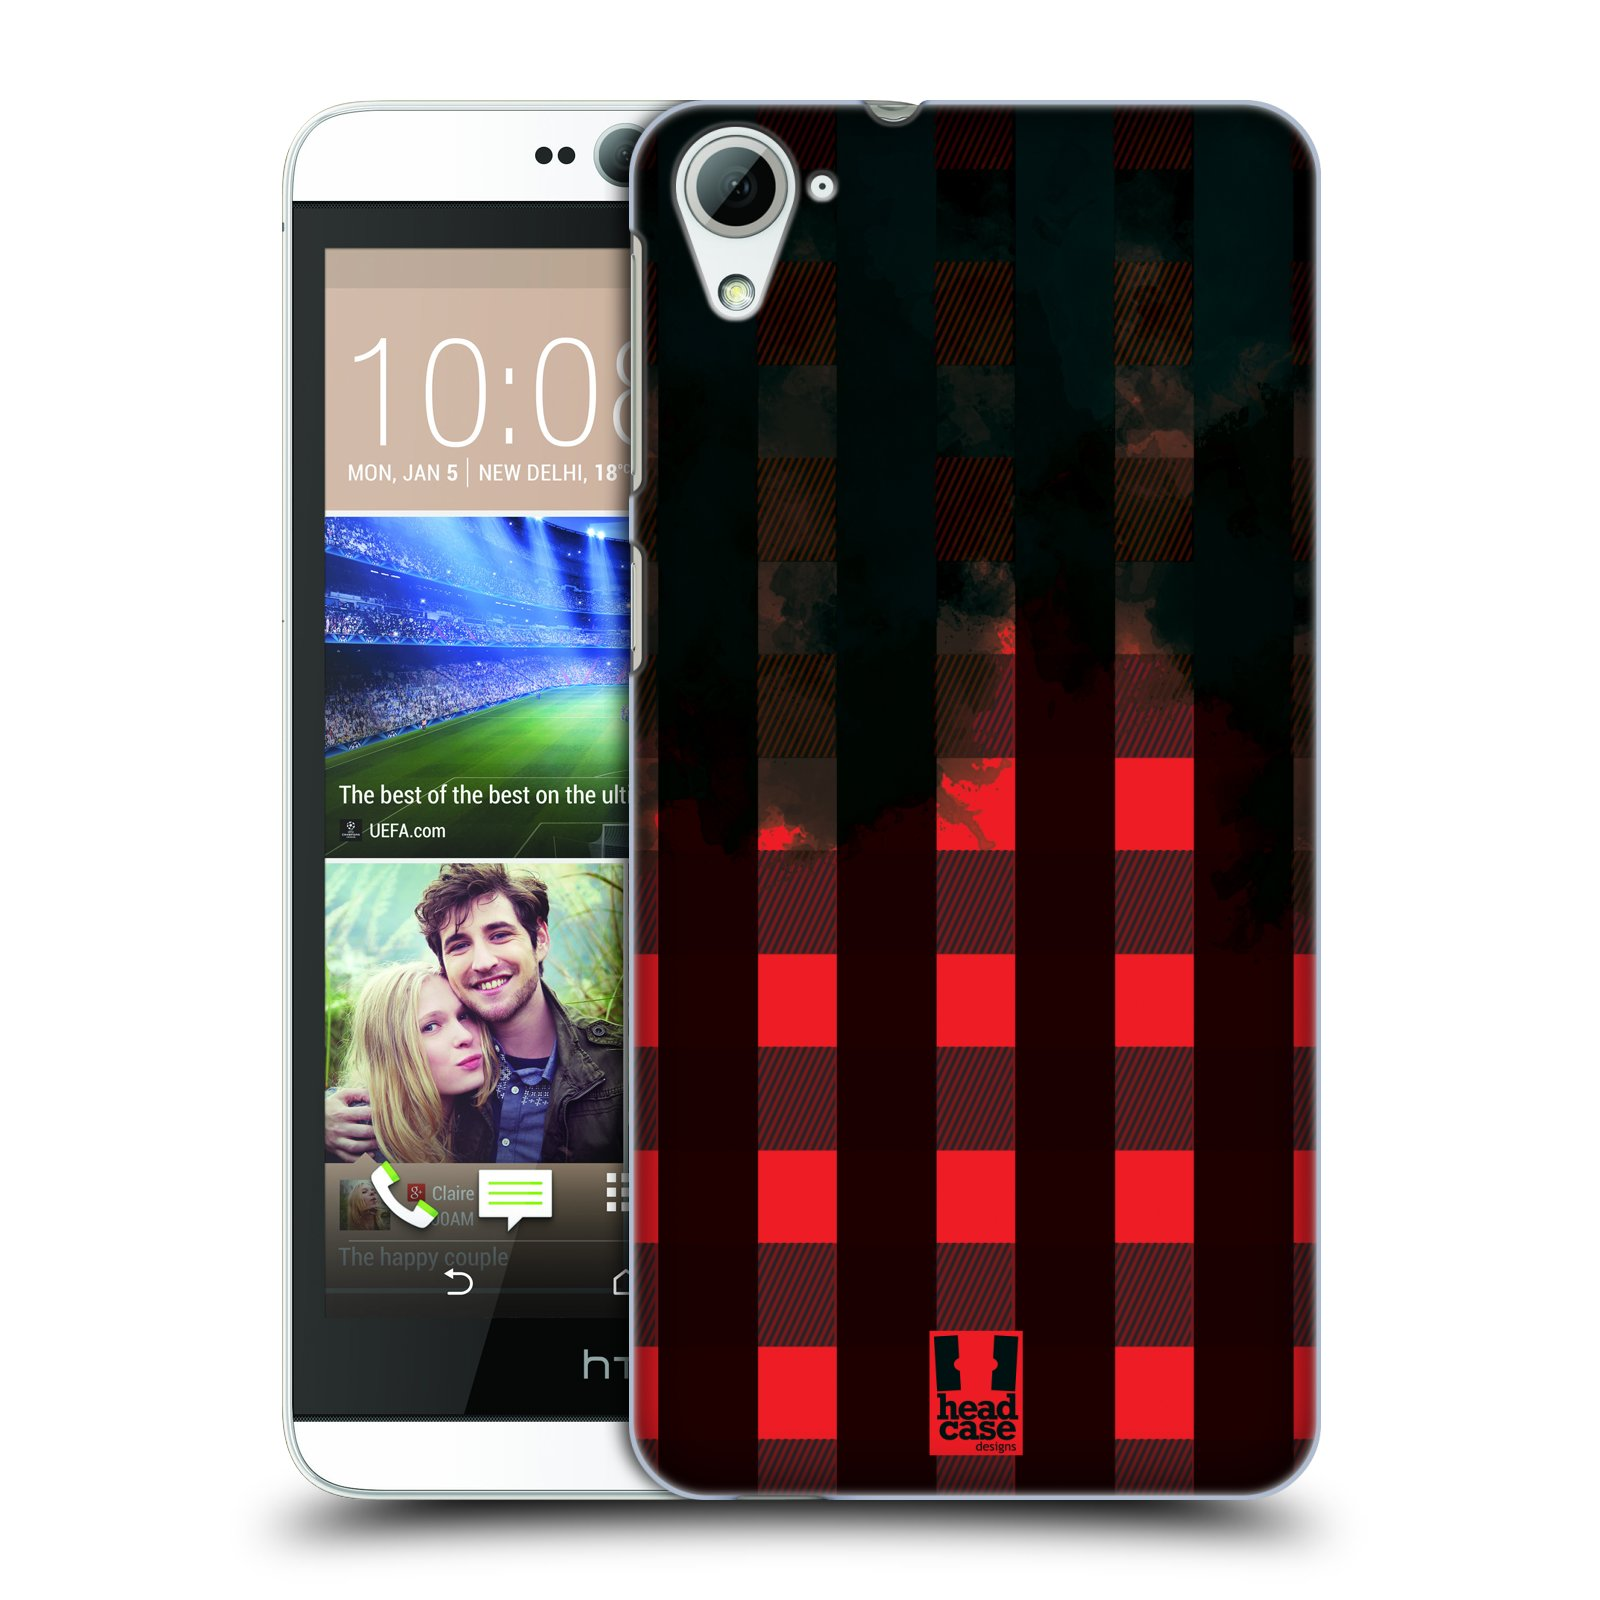 Plastové pouzdro na mobil HTC Desire 826 HEAD CASE FLANEL RED BLACK (Kryt či obal na mobilní telefon HTC Desire 826 Dual SIM)